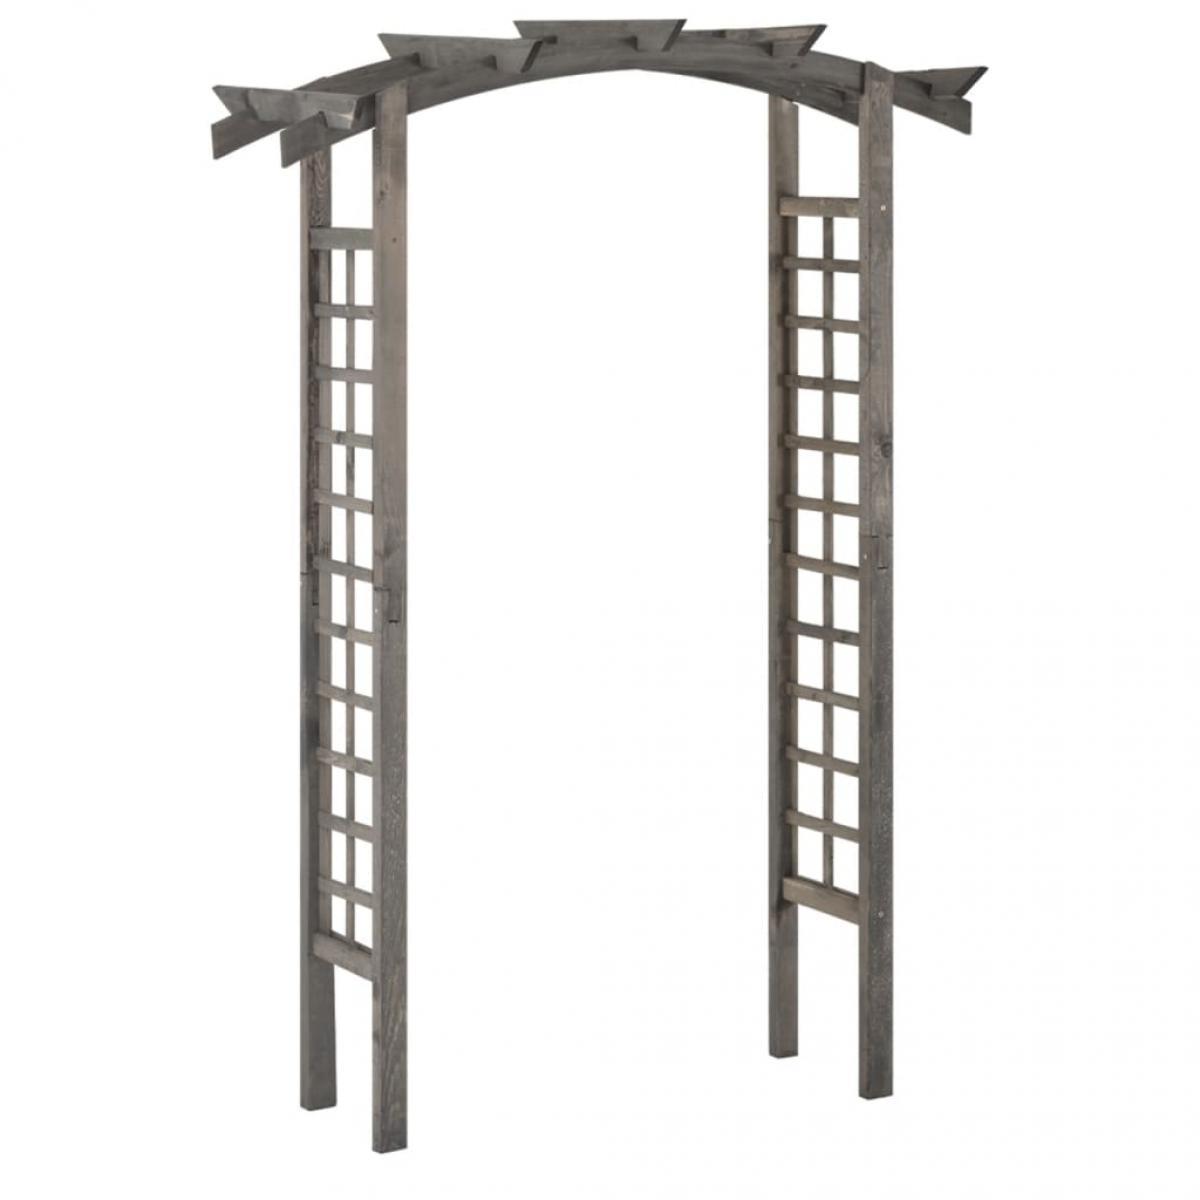 Arco enrejado de madera de pino impregnada gris 150x50x220 cm